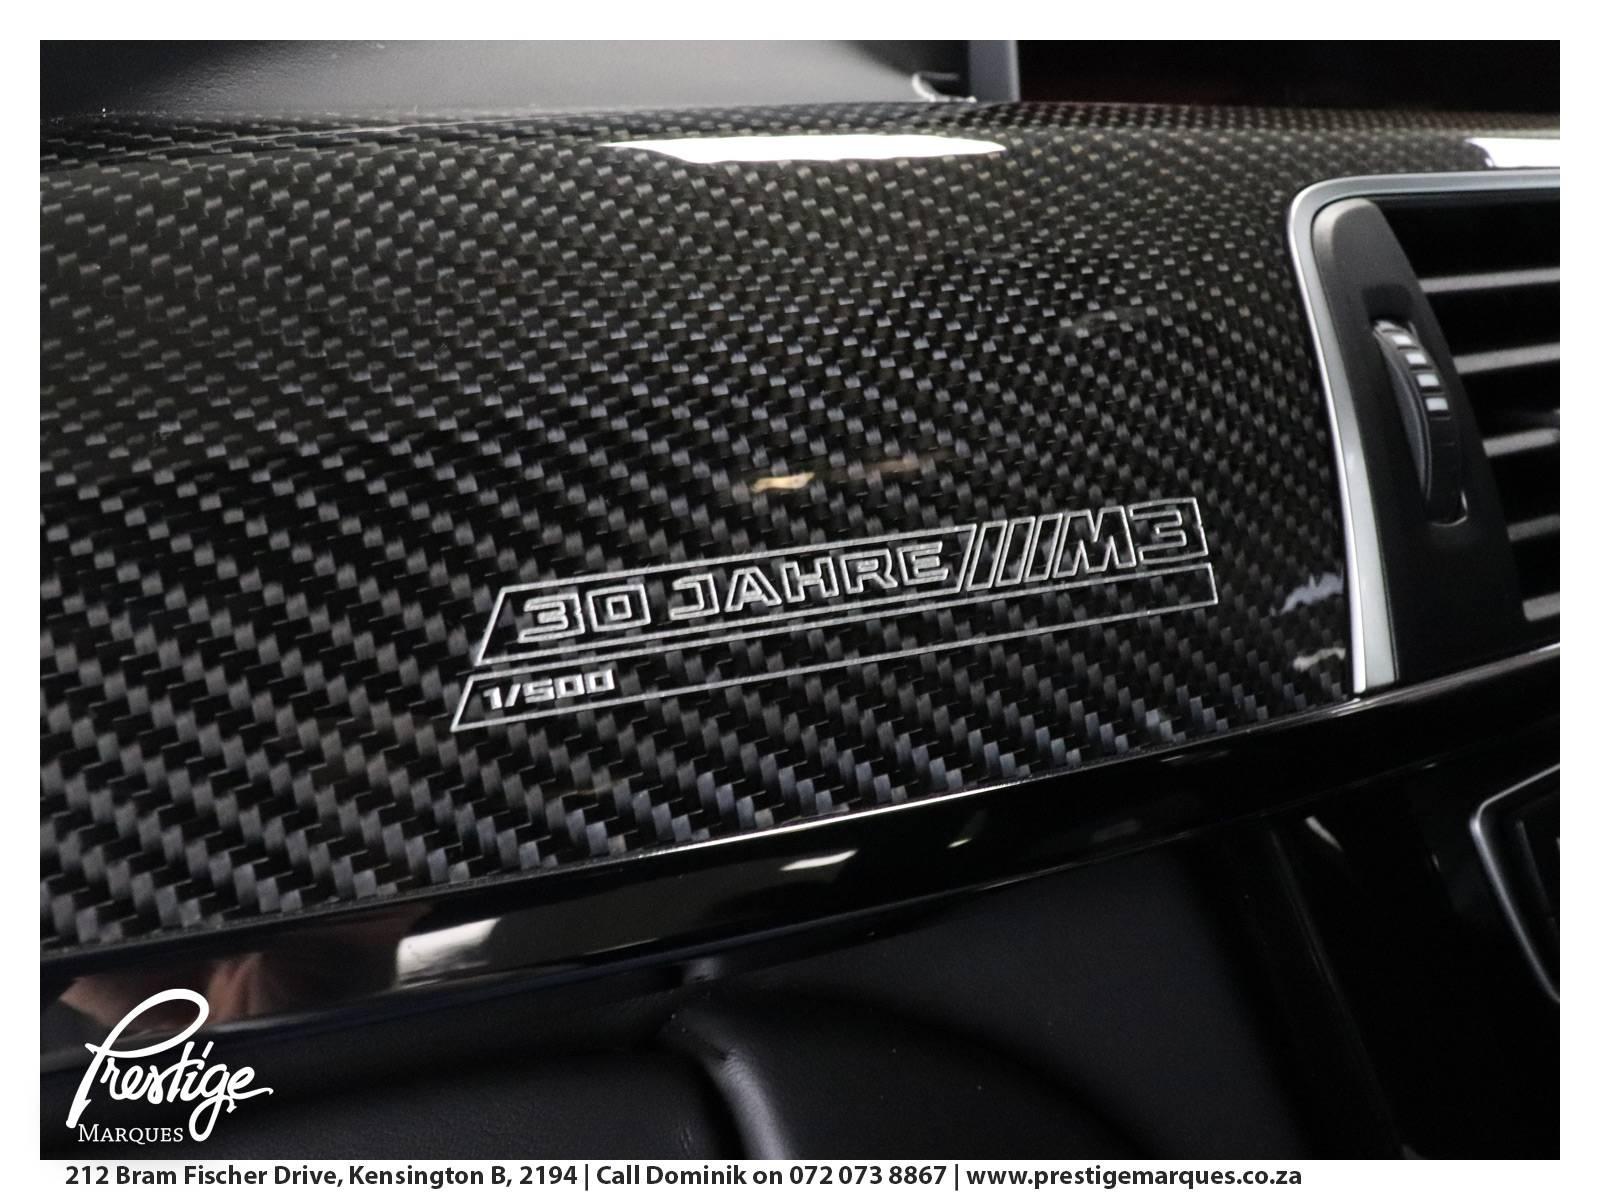 2016-BMW-M3-MDCT-30-Jarare-Prestige-Marques-Randburg-Sandton-16